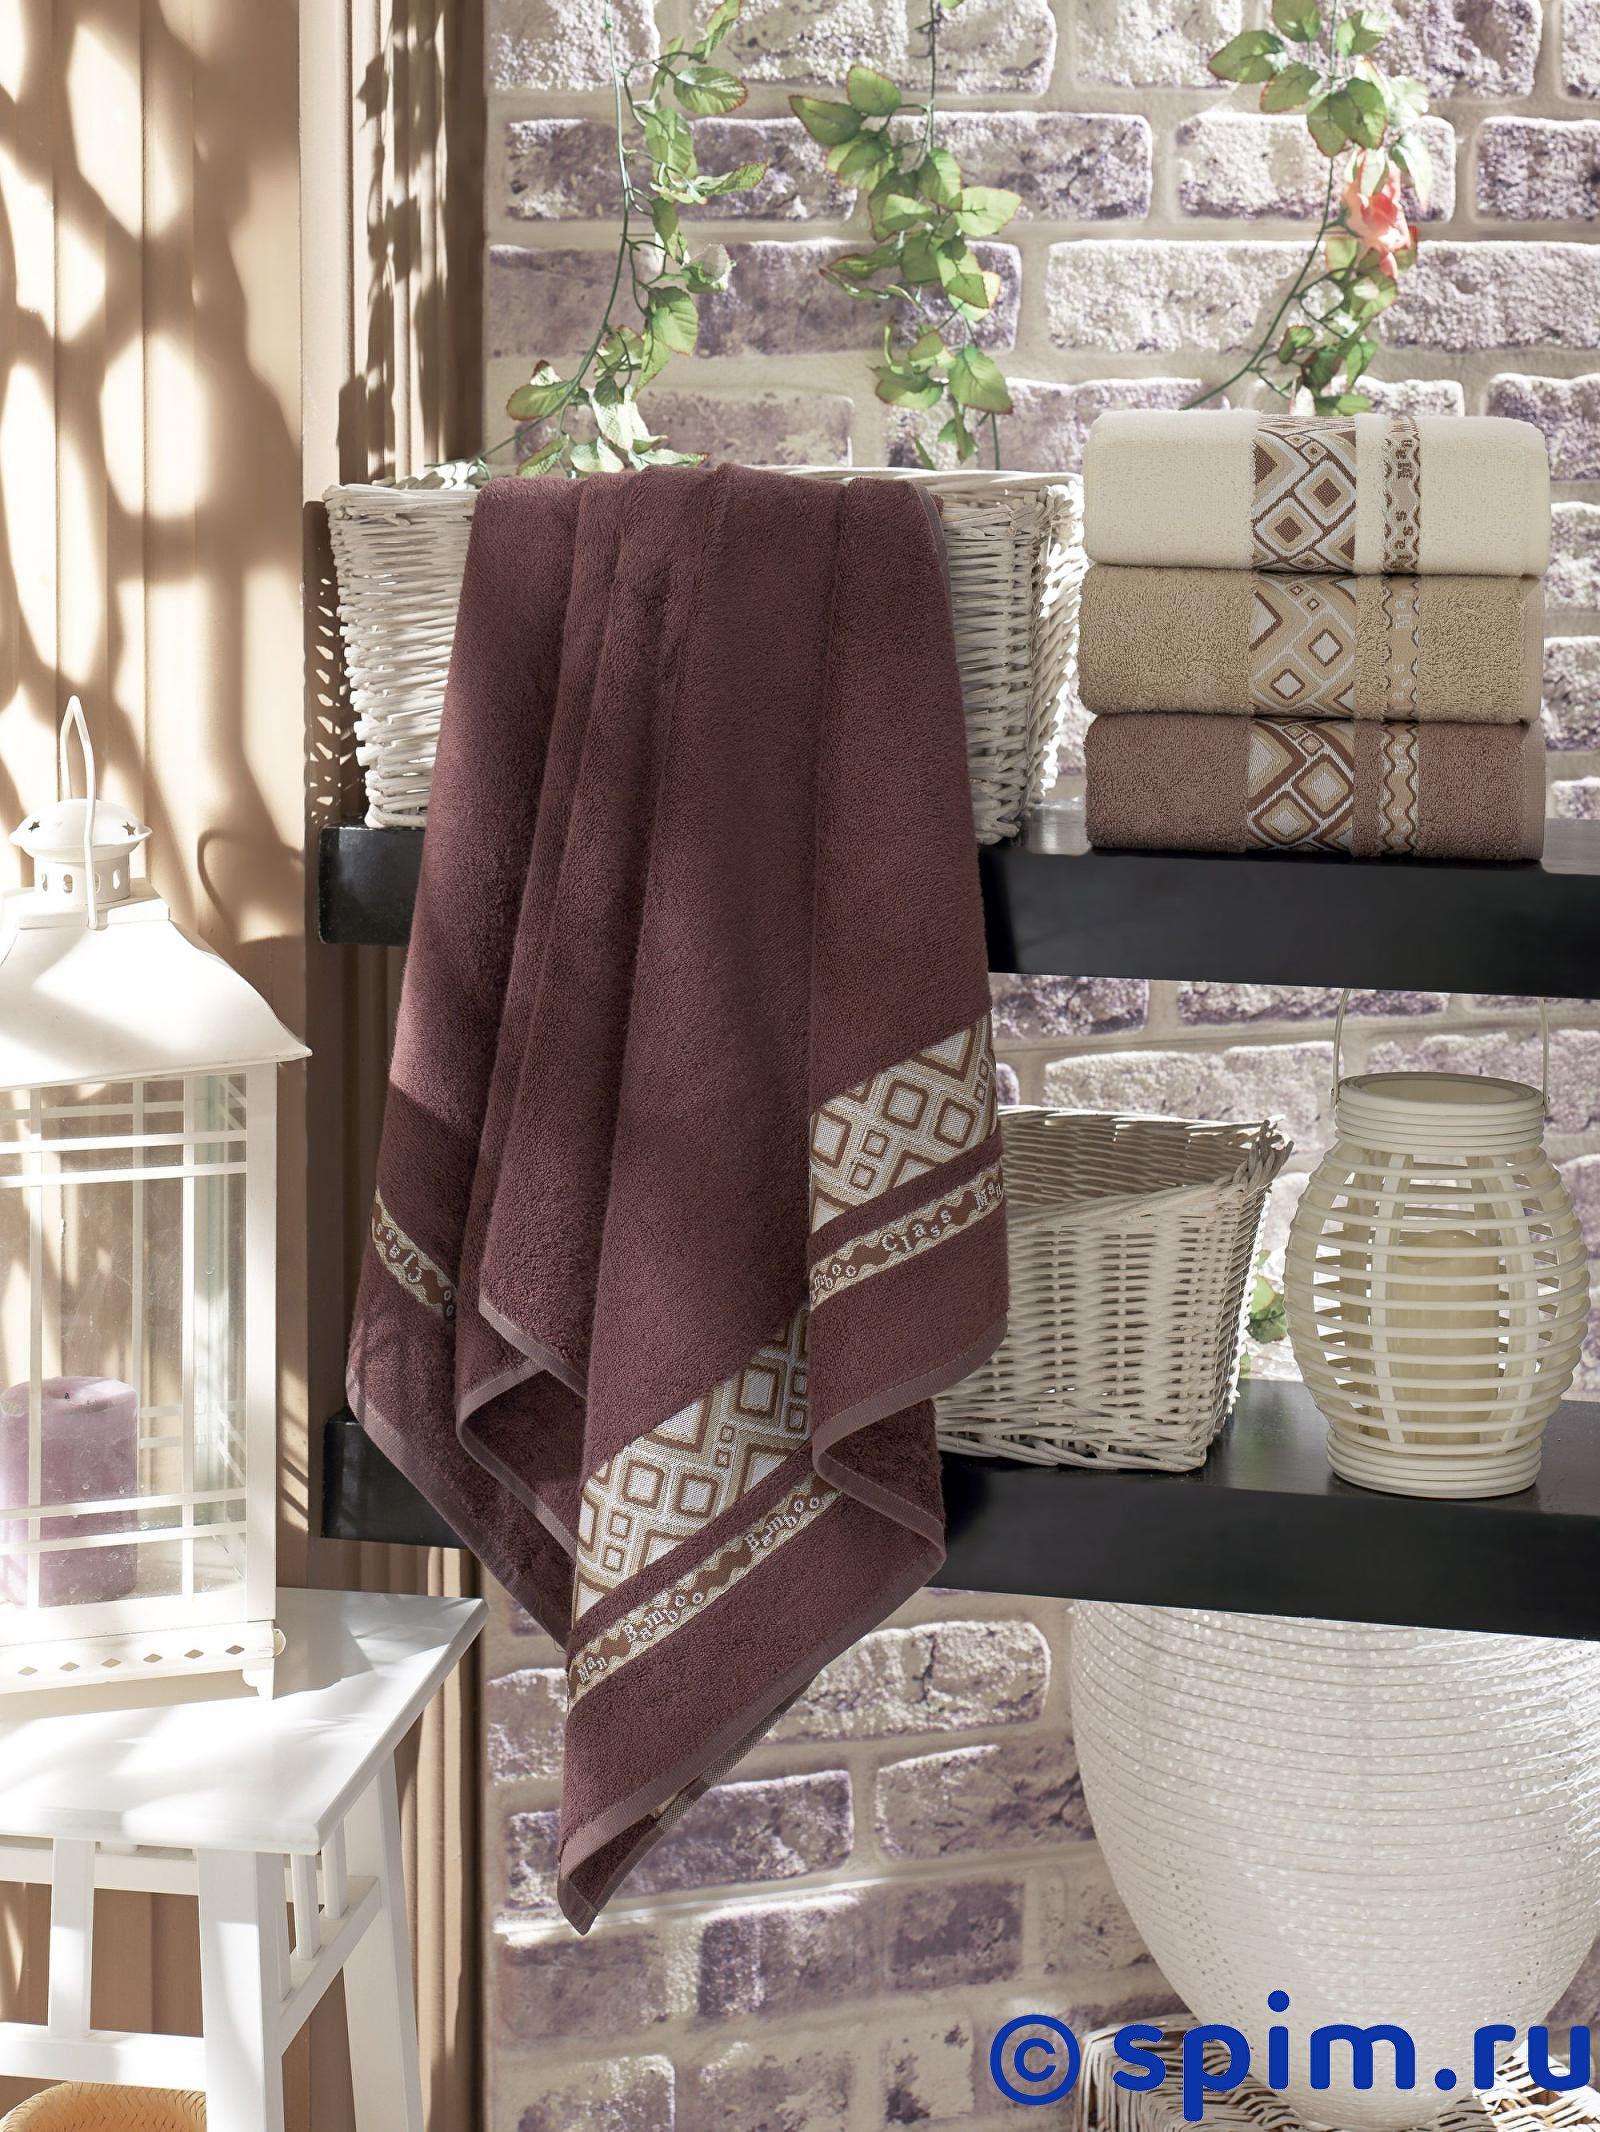 Набор из 4-х полотенец Do&co Camellia 70х140 см полотенца do n co полотенце lady цвет мятный набор